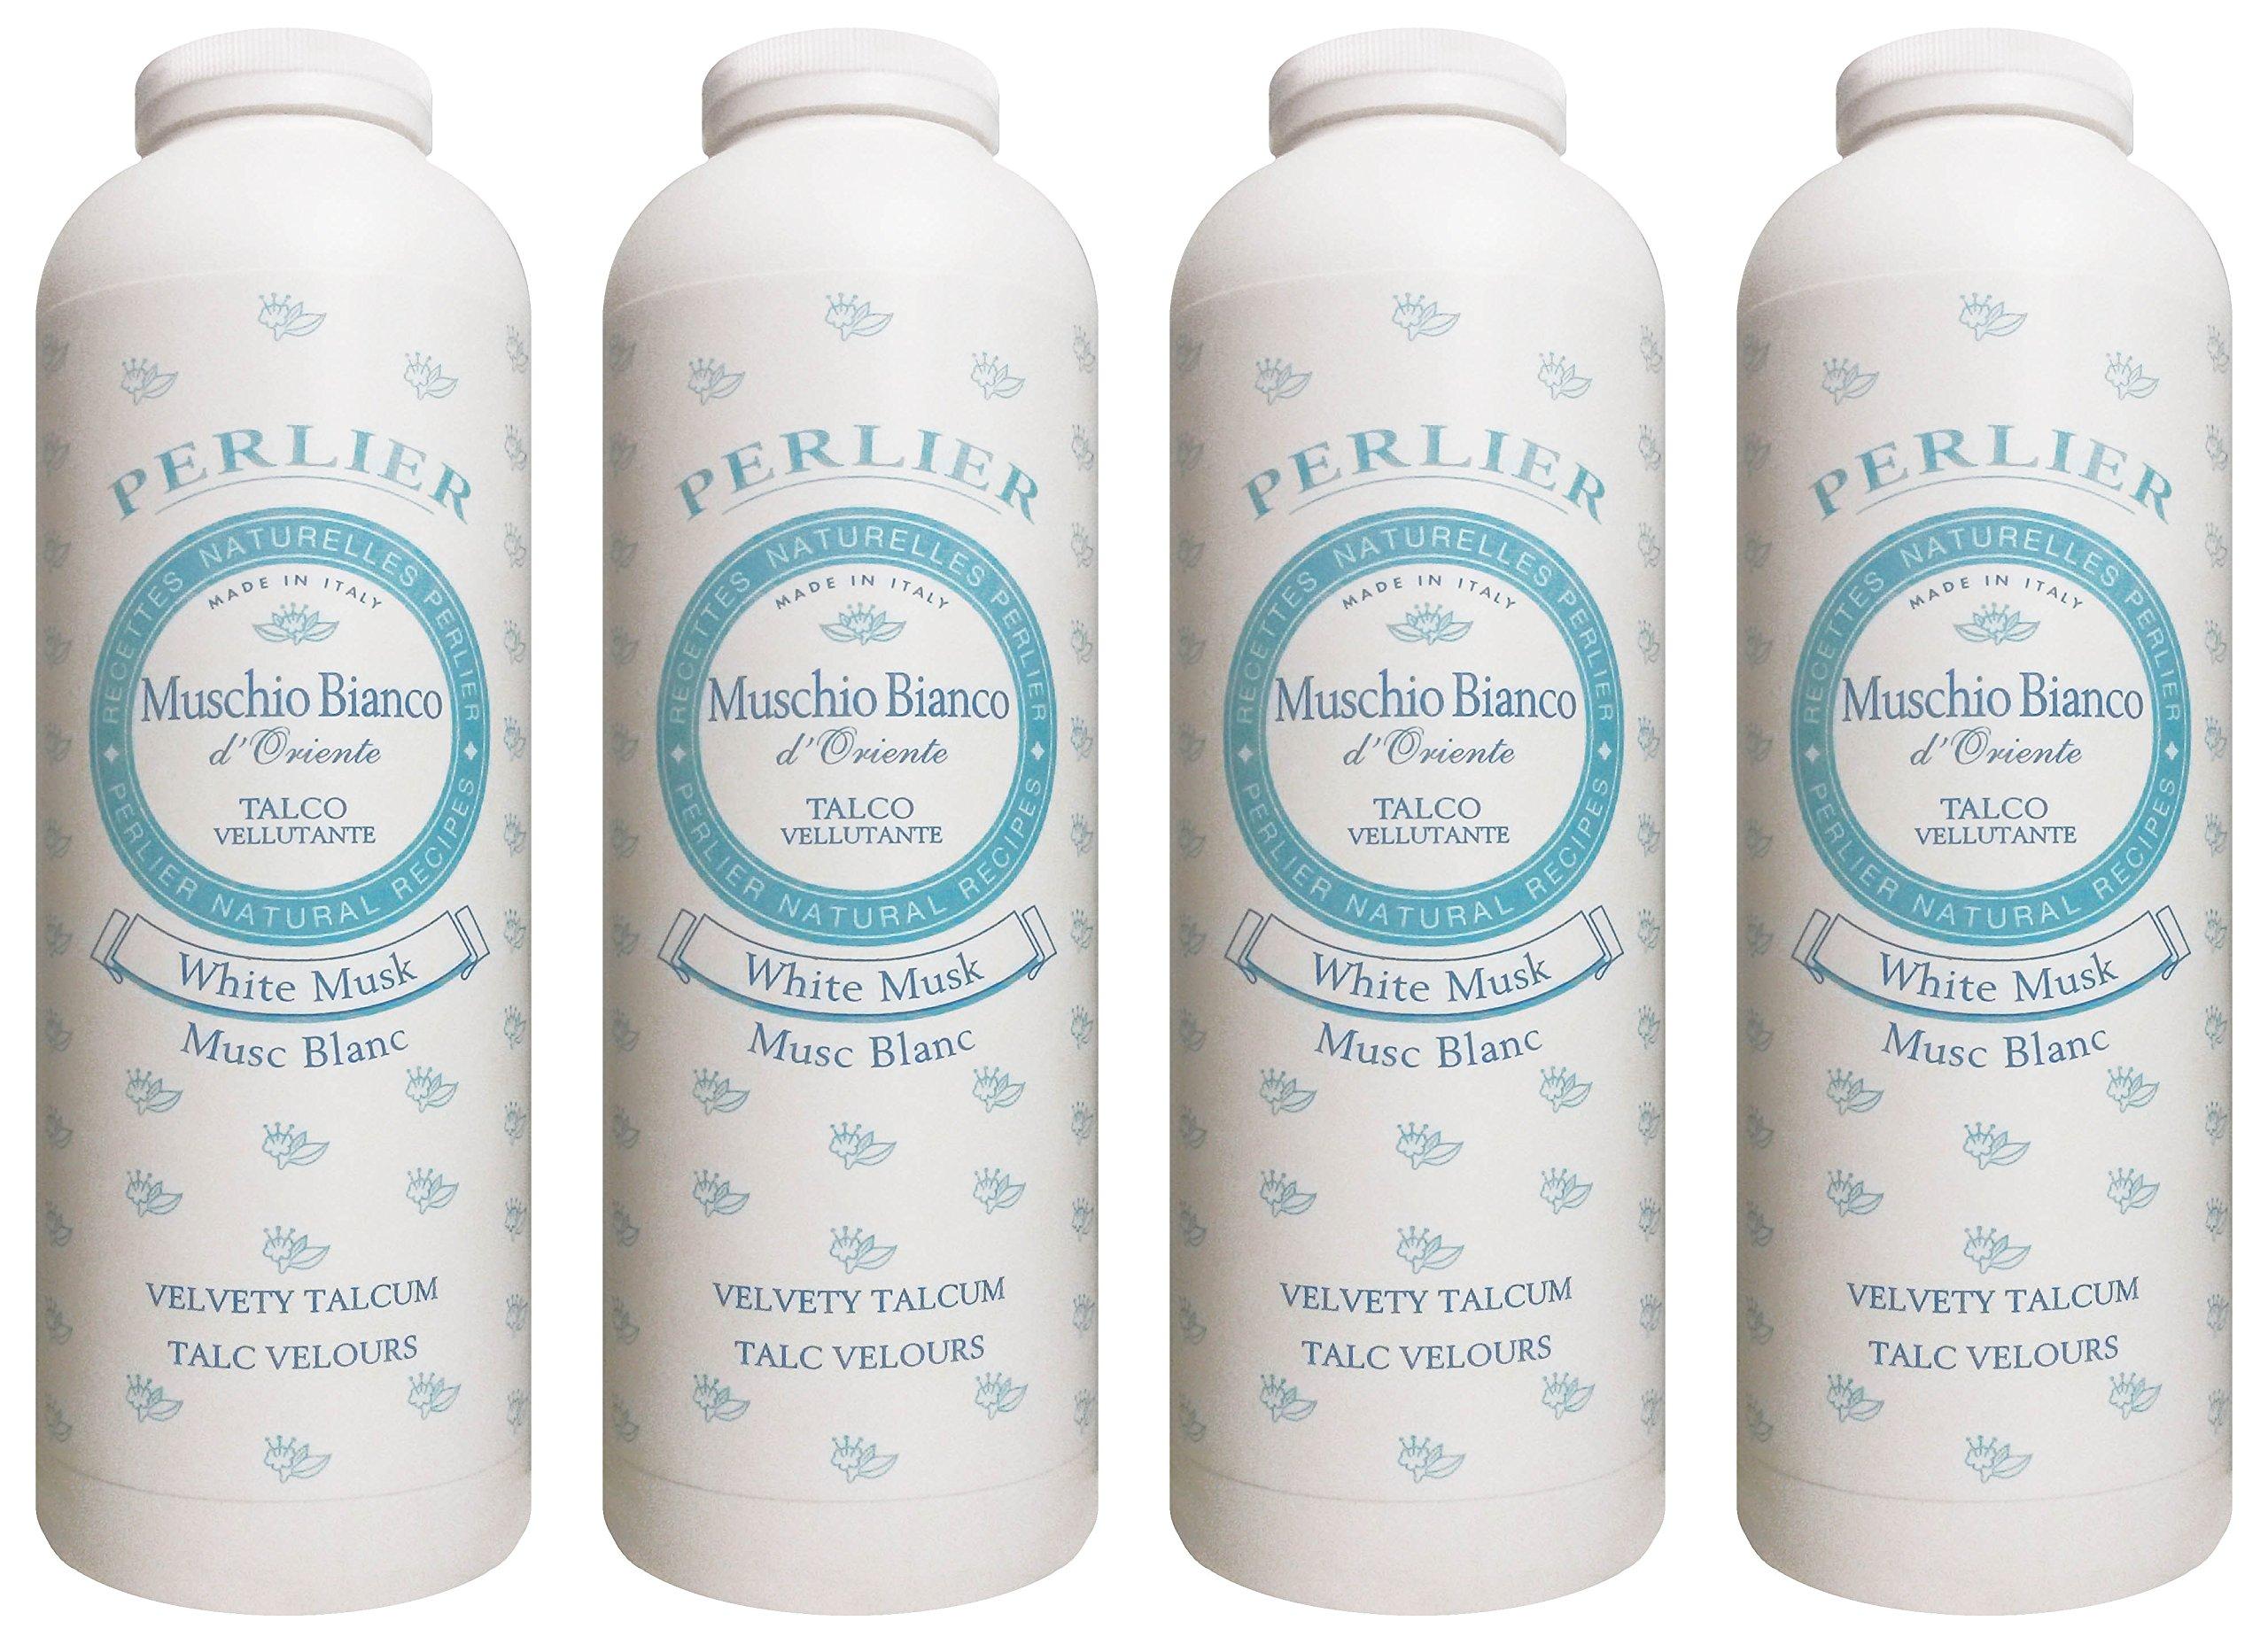 Perlier:''Muschio Bianco d'Oriente'' Velvety Talcum Powder, White Musk Scent - 3.5 Ounce (100g) Bottles (Pack of 4) [ Italian Import ]